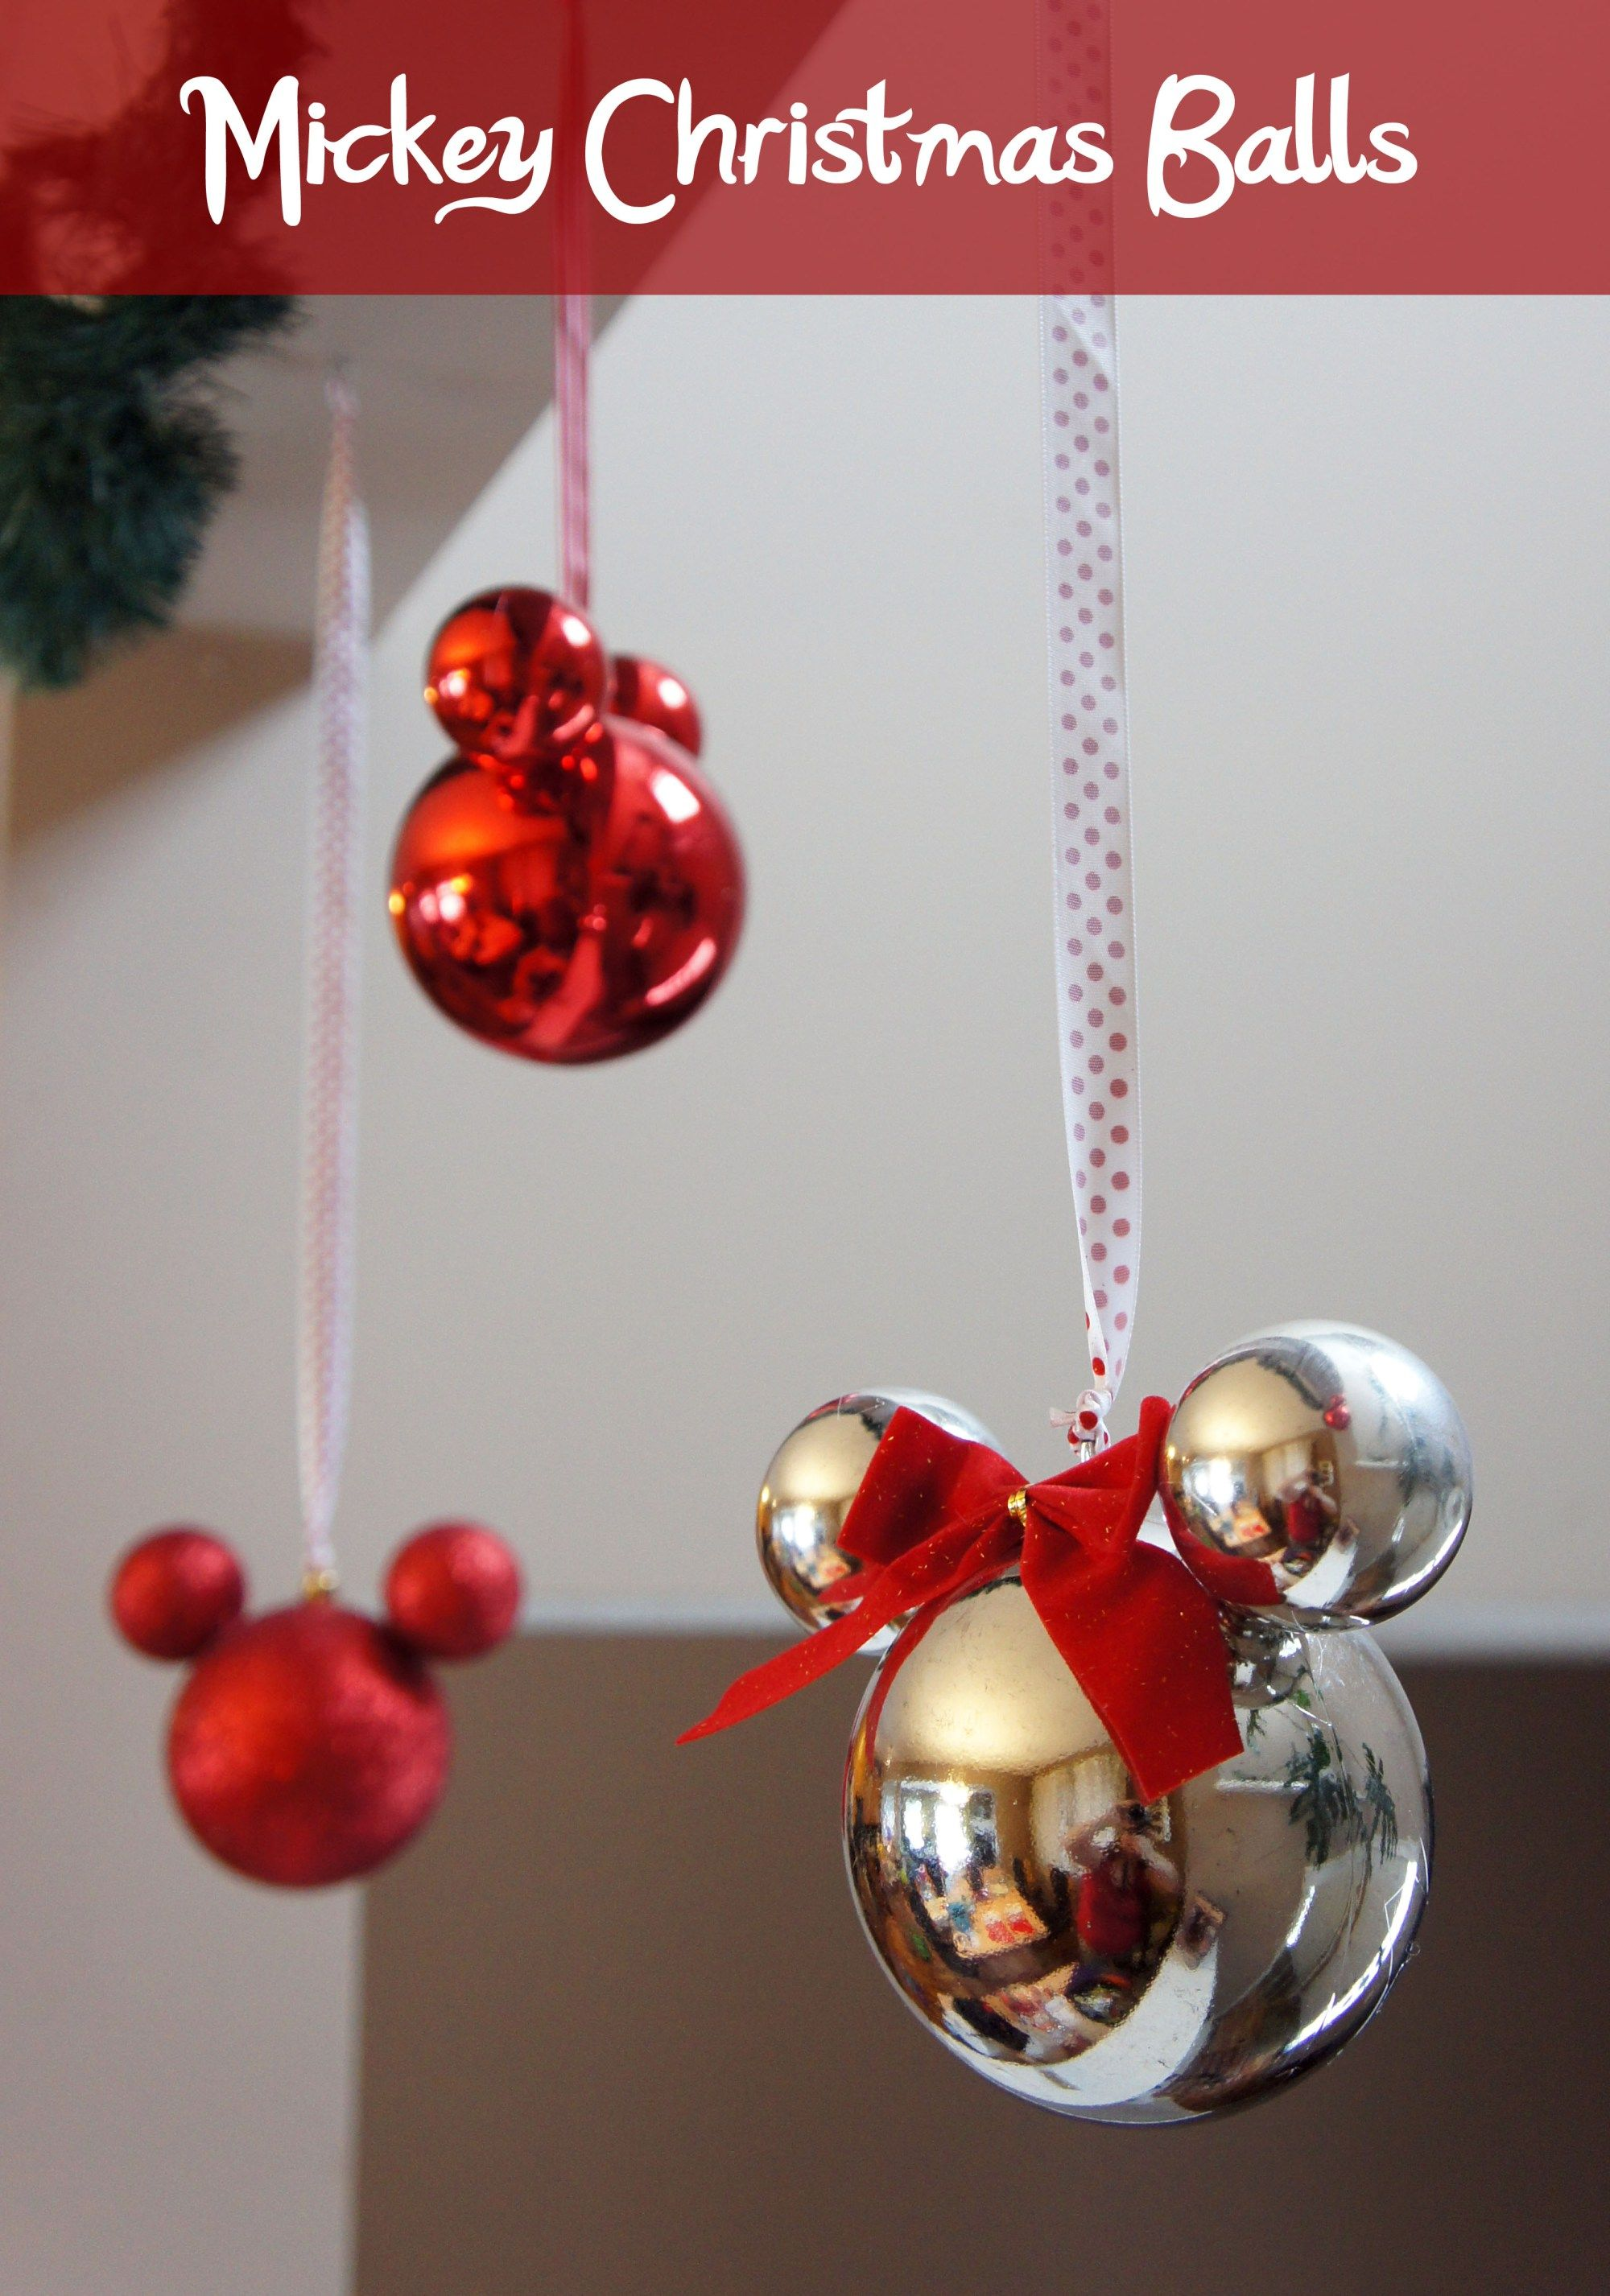 Weve got ears mickey christmas balls mickey mouse ornaments mickey mouse ornaments solutioingenieria Gallery